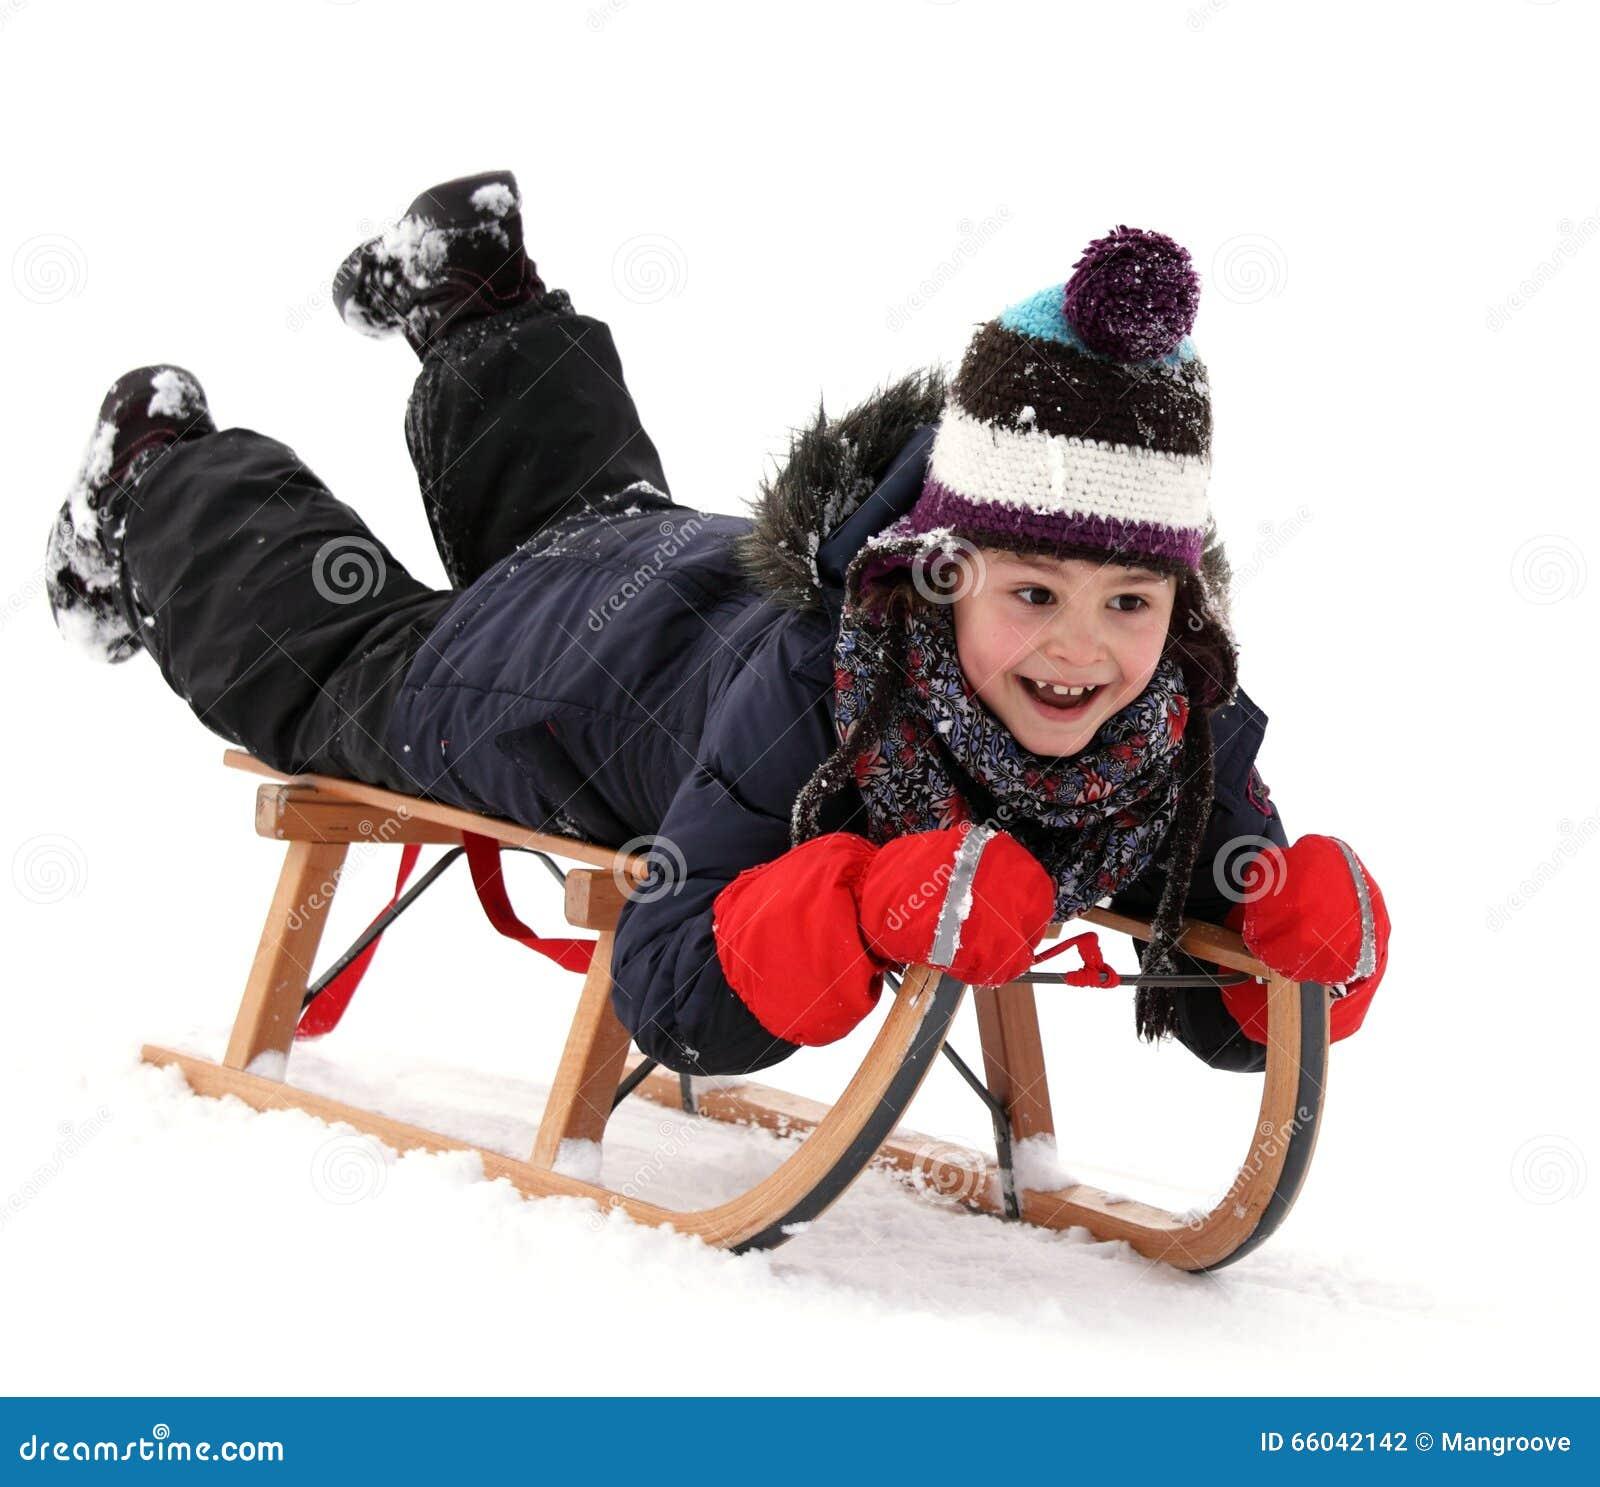 Happy child on sledge in winter, winter sports